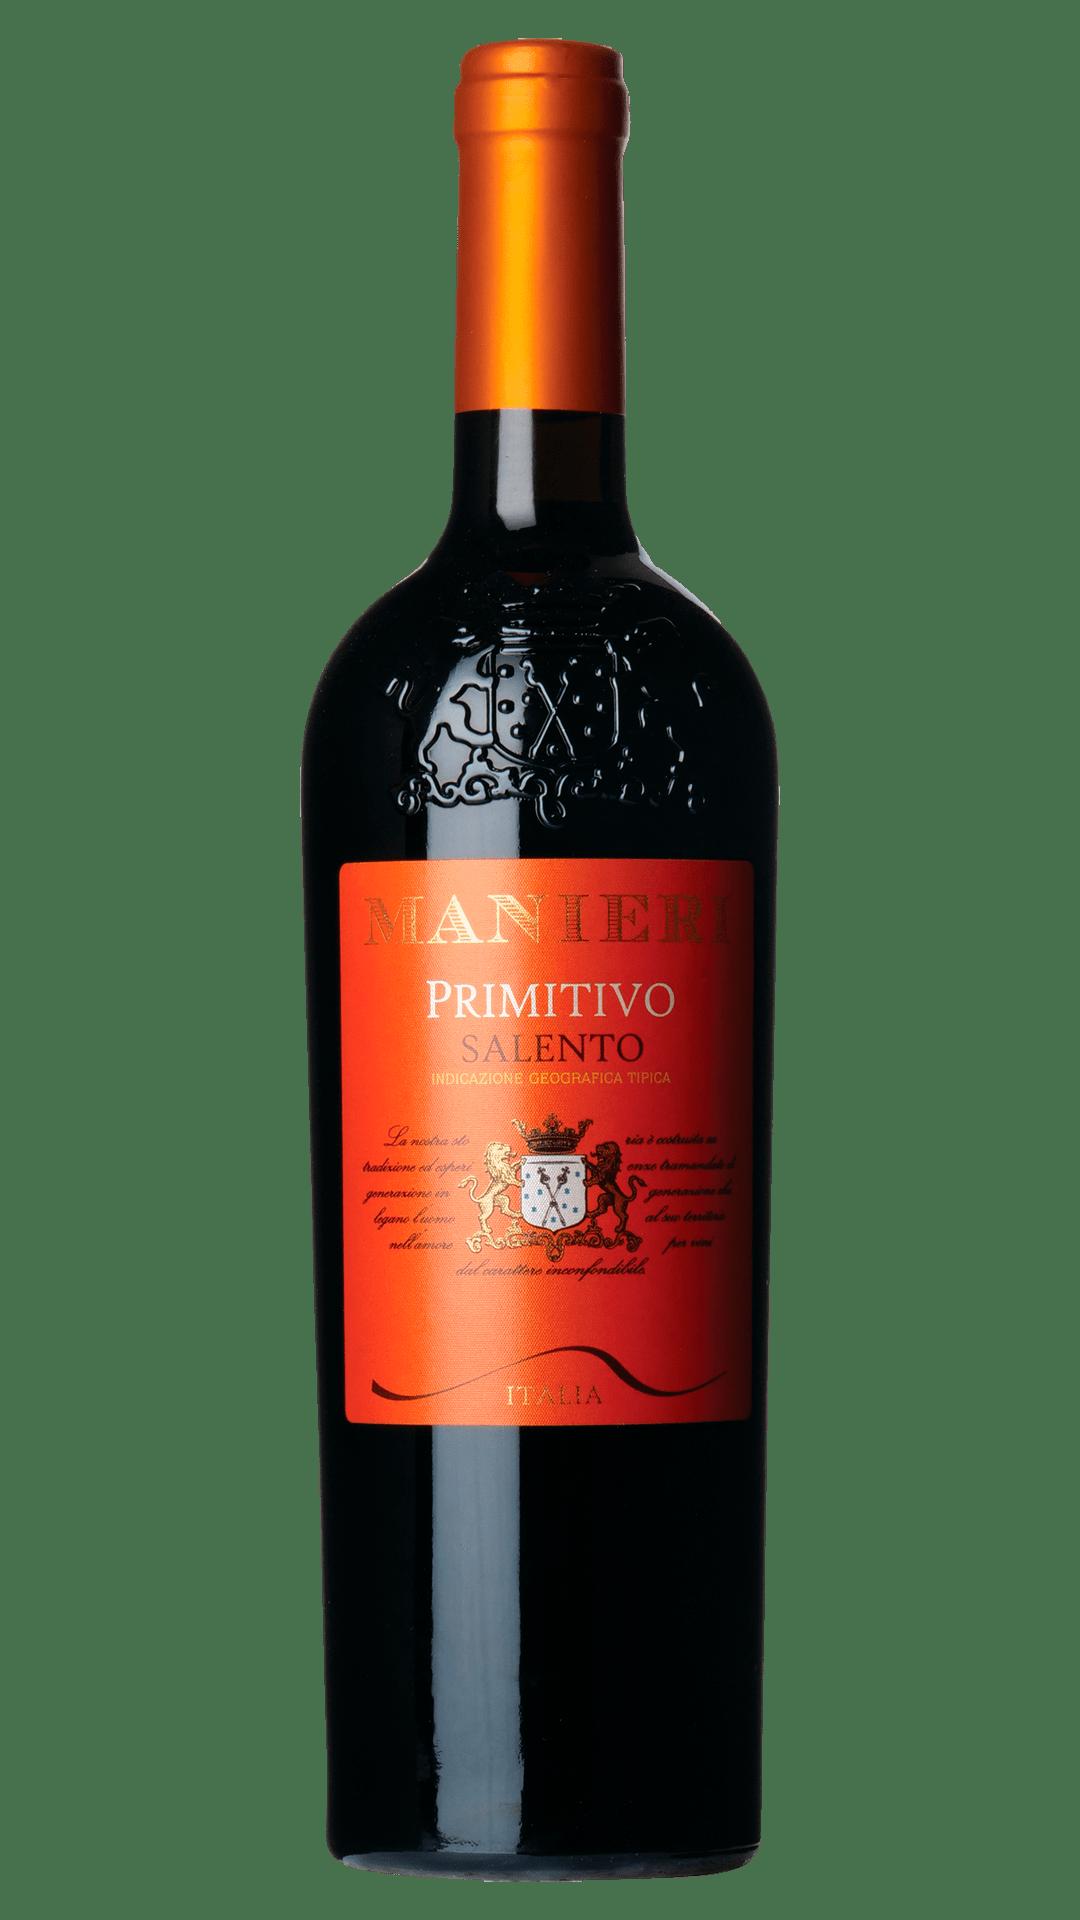 Primitivo-Salento-I.G.T.-Manieri